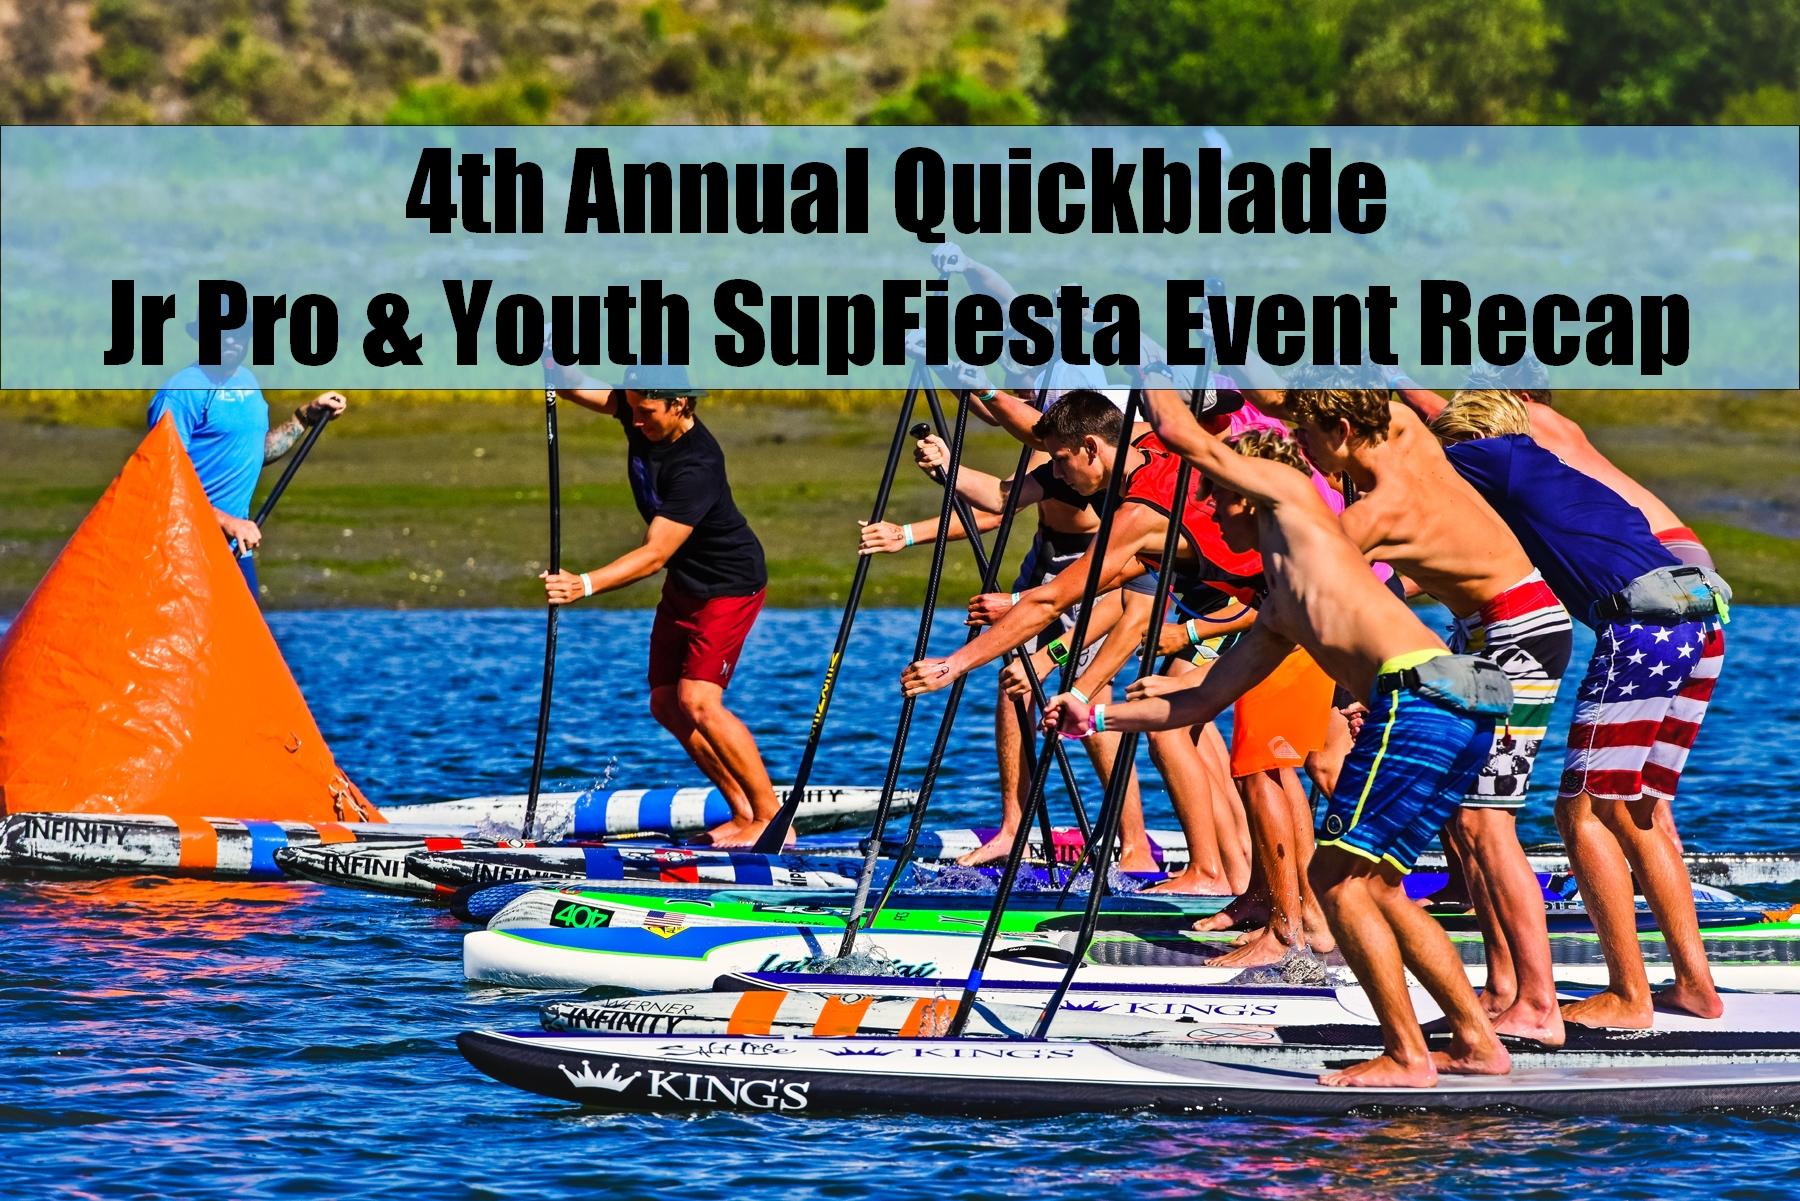 4th Annual Quickblade Jr Pro & Youth SupFiesta Event Recap